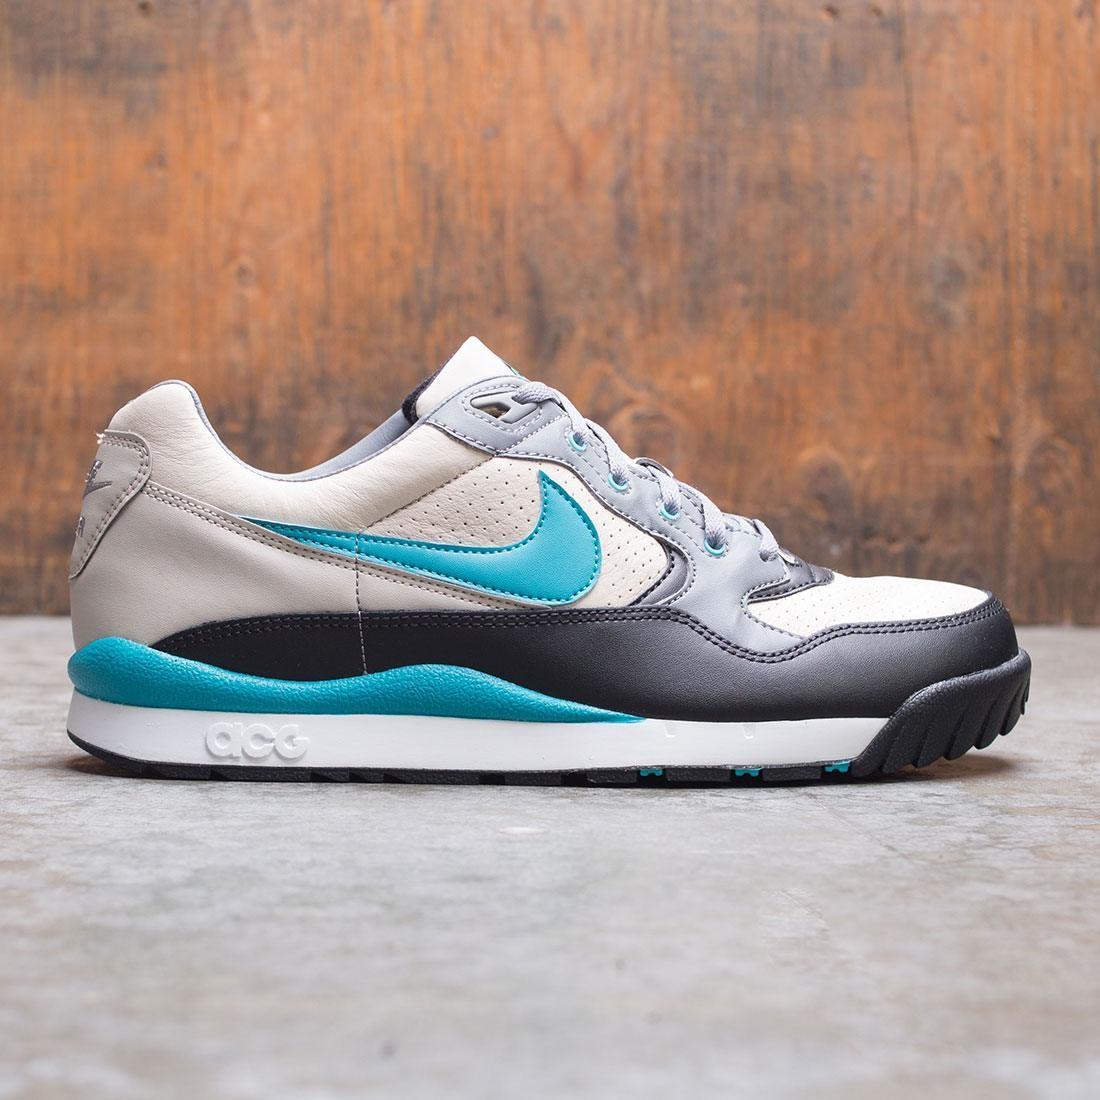 Nike Men Air Wildwood Acg (desert sand / teal nebula-cool grey-white)